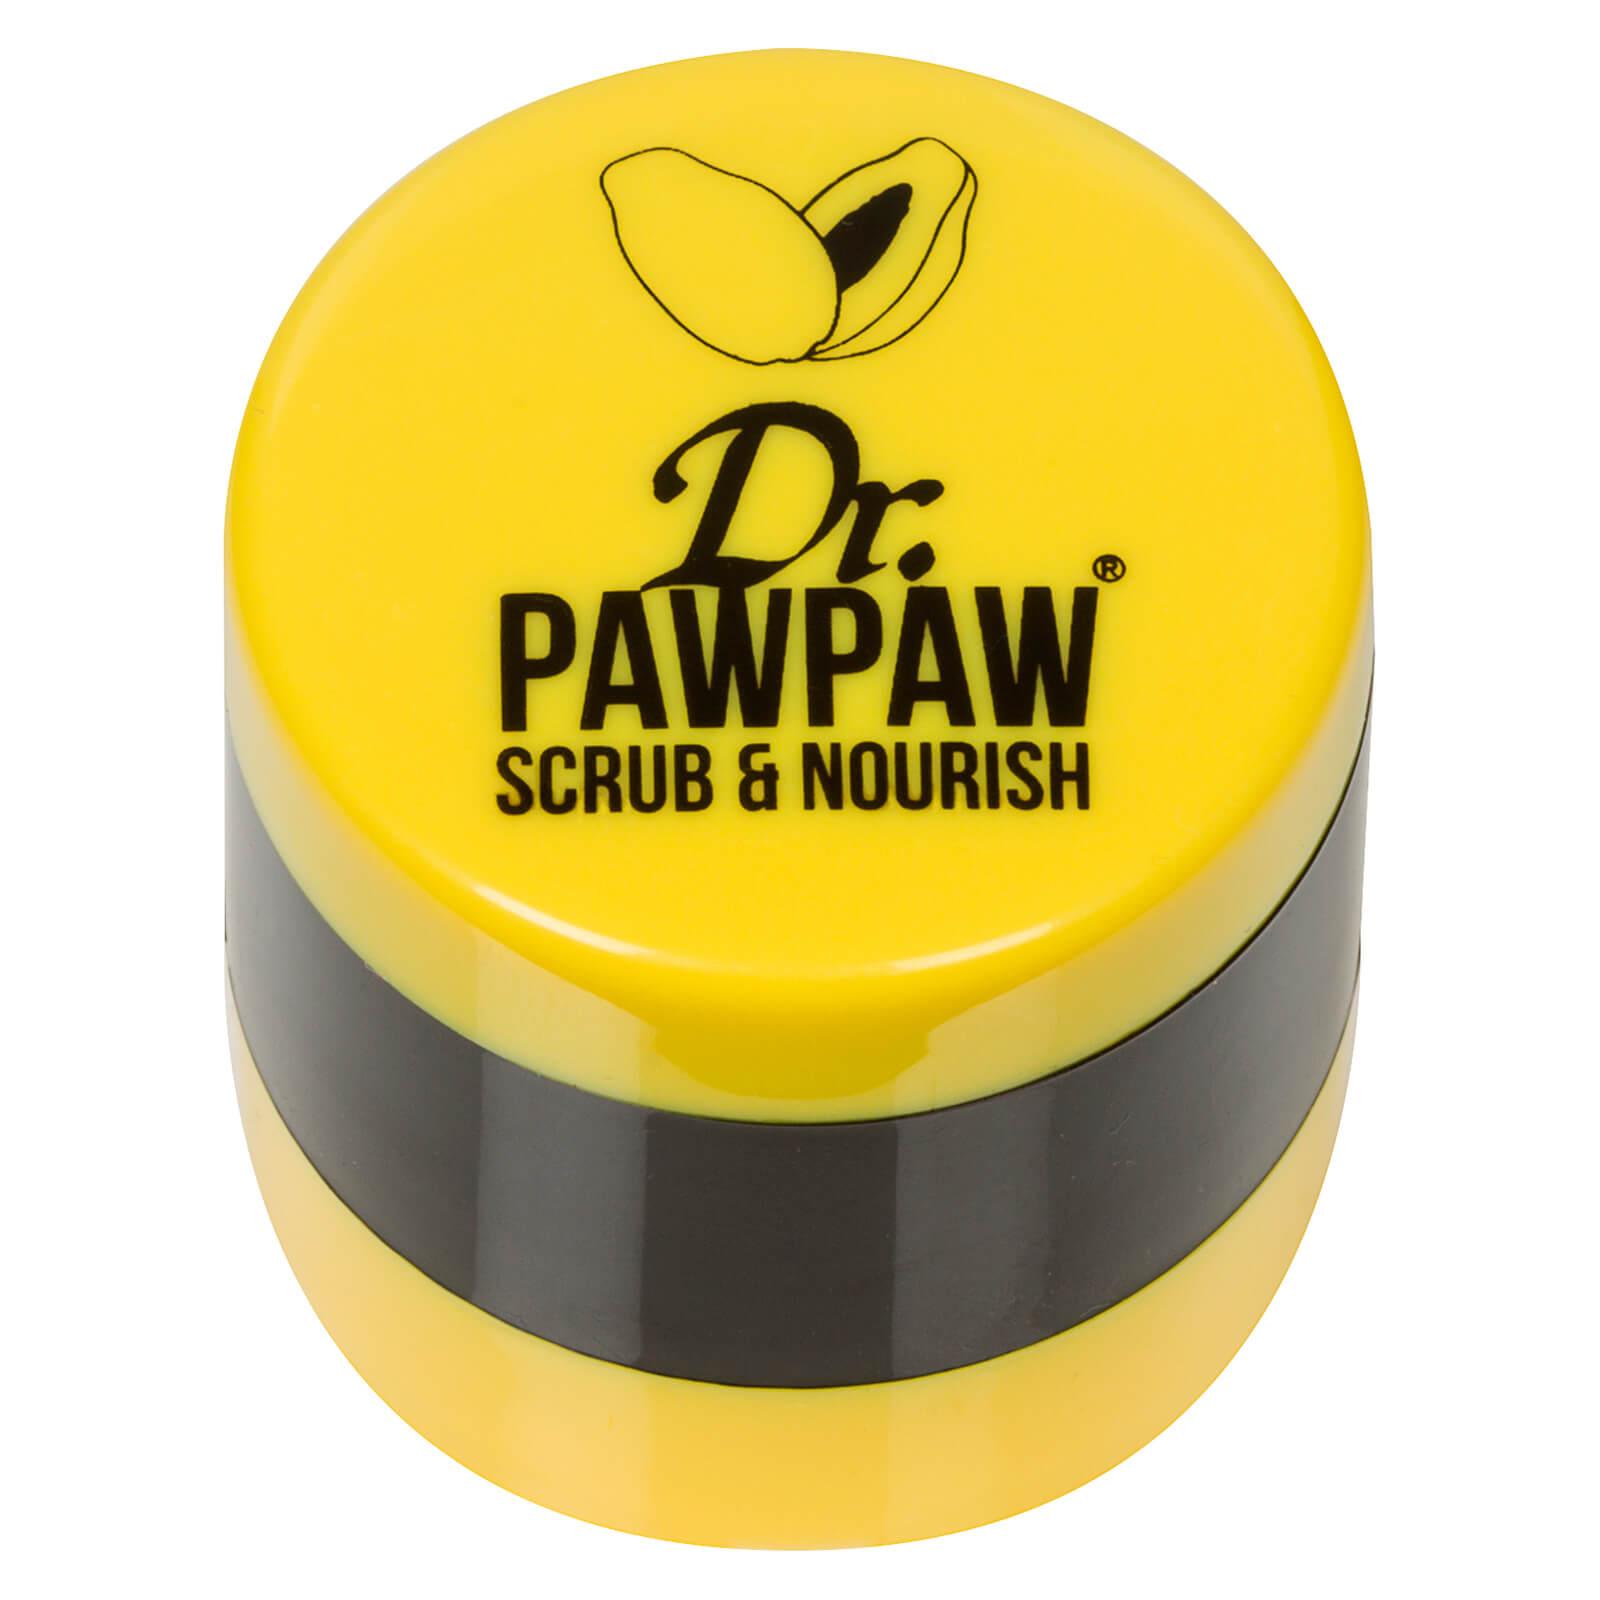 Dr.PAWPAW Scrub and Nourish